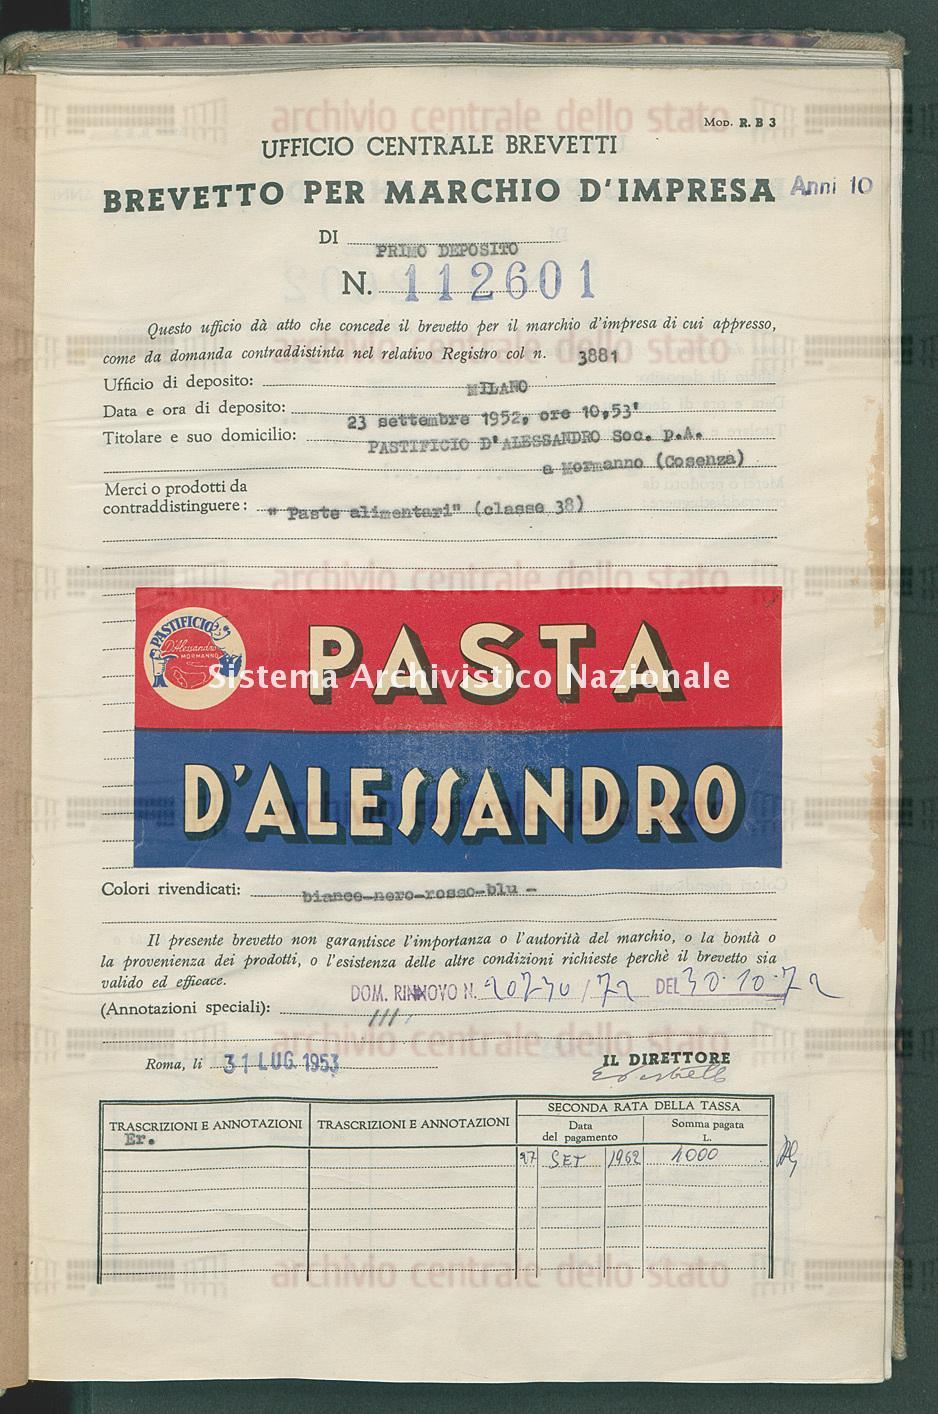 'Paste alimentari' Pastificio D'Alessandro Soc.P.A. (31/07/1953)